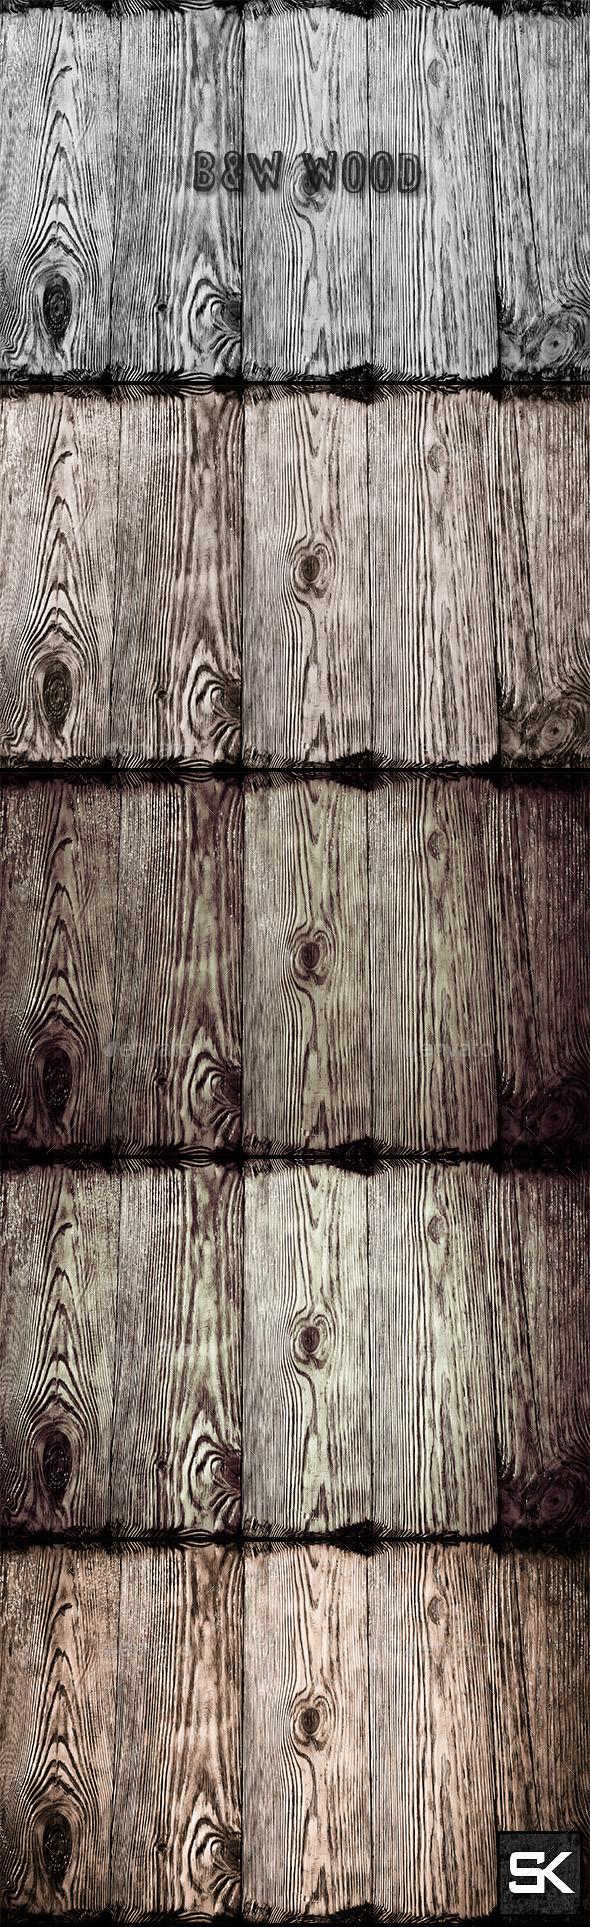 GraphicRiver B&W Wood 2 10285200